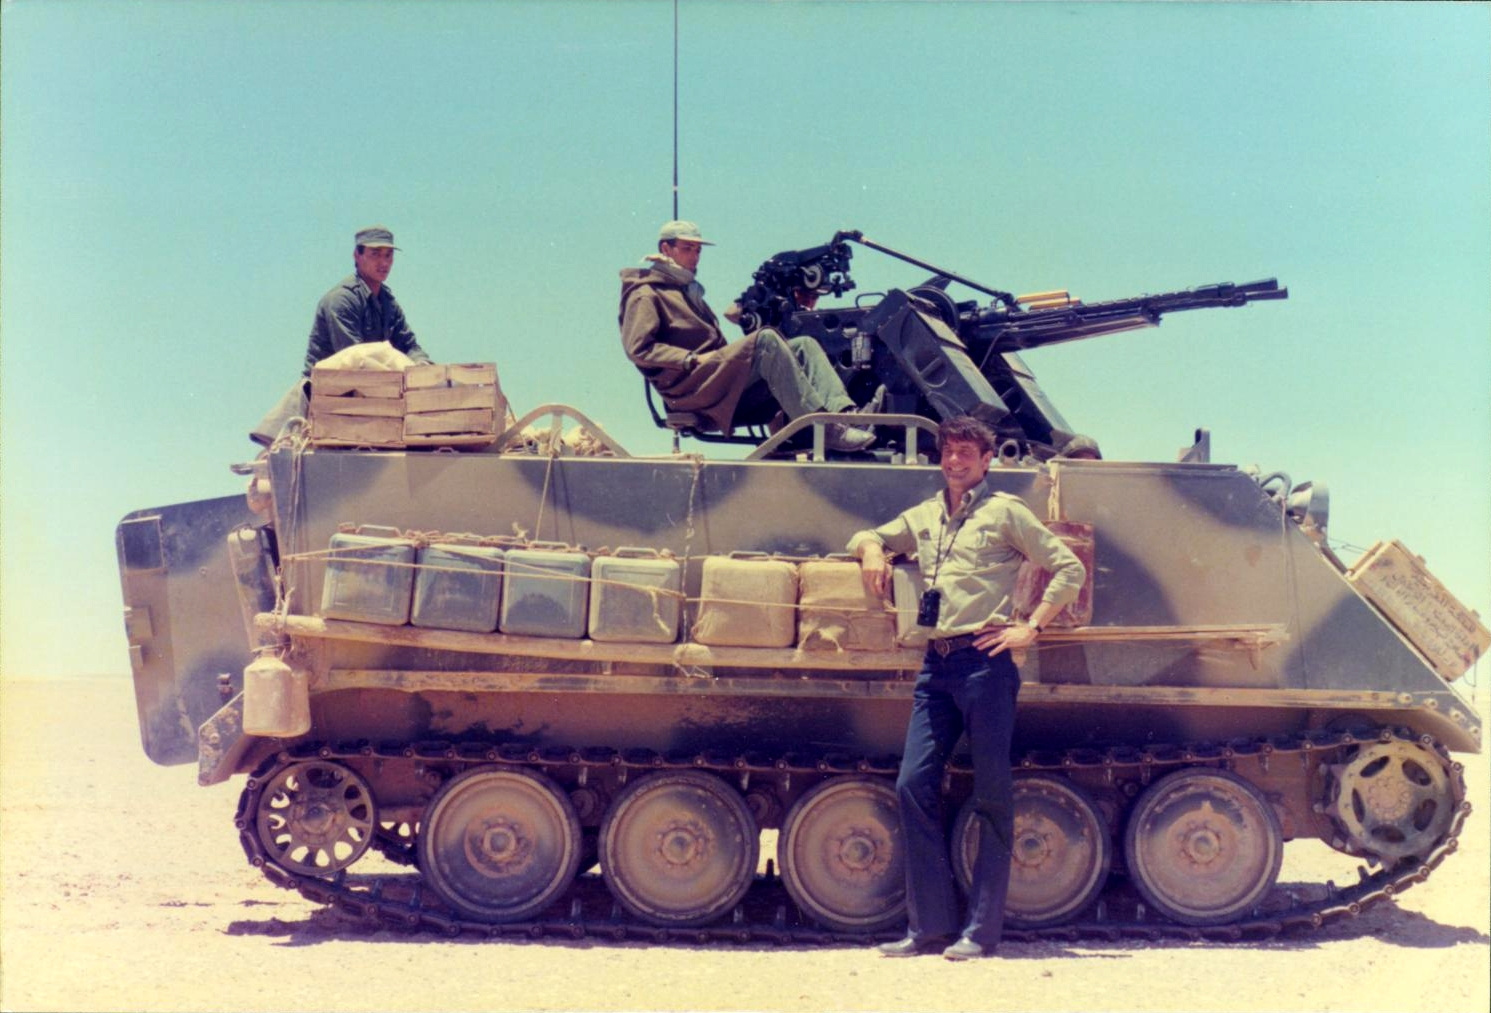 Le conflit armé du sahara marocain - Page 11 46940084754_e62e5a5e51_o